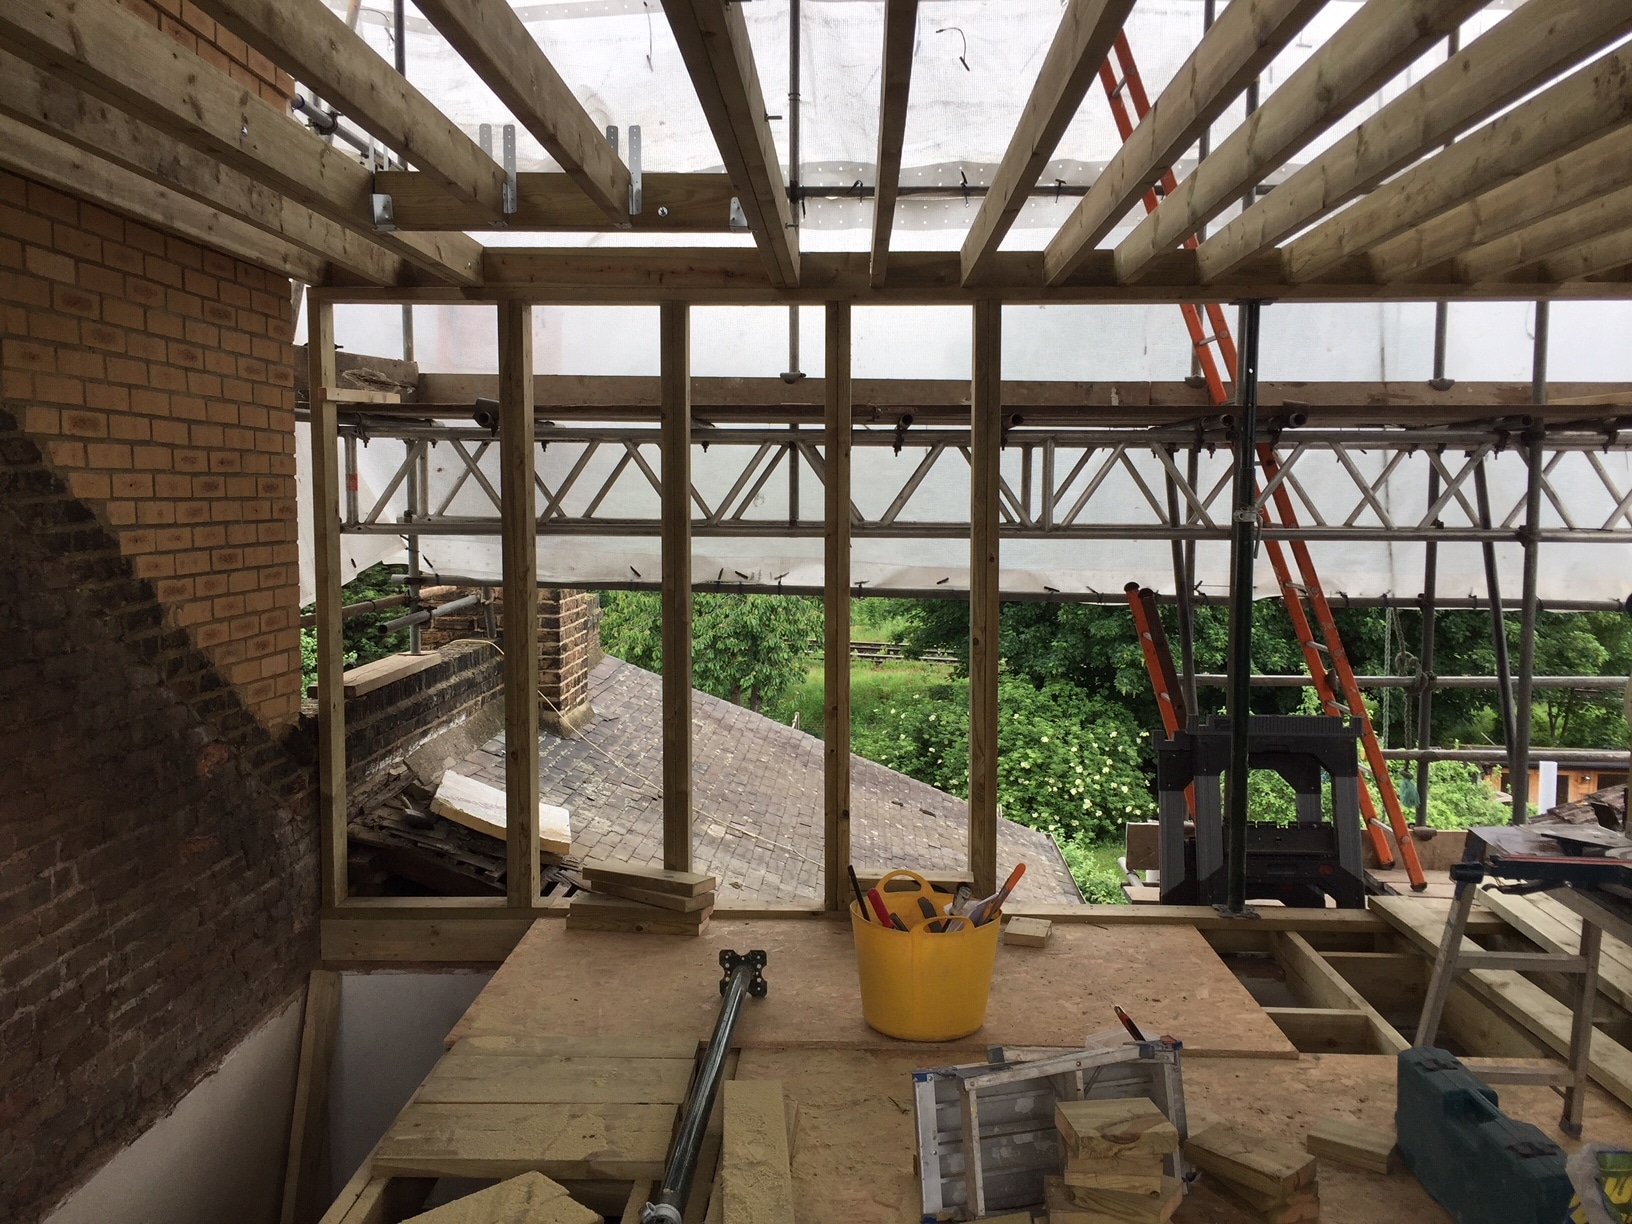 Loft conversion construction progress